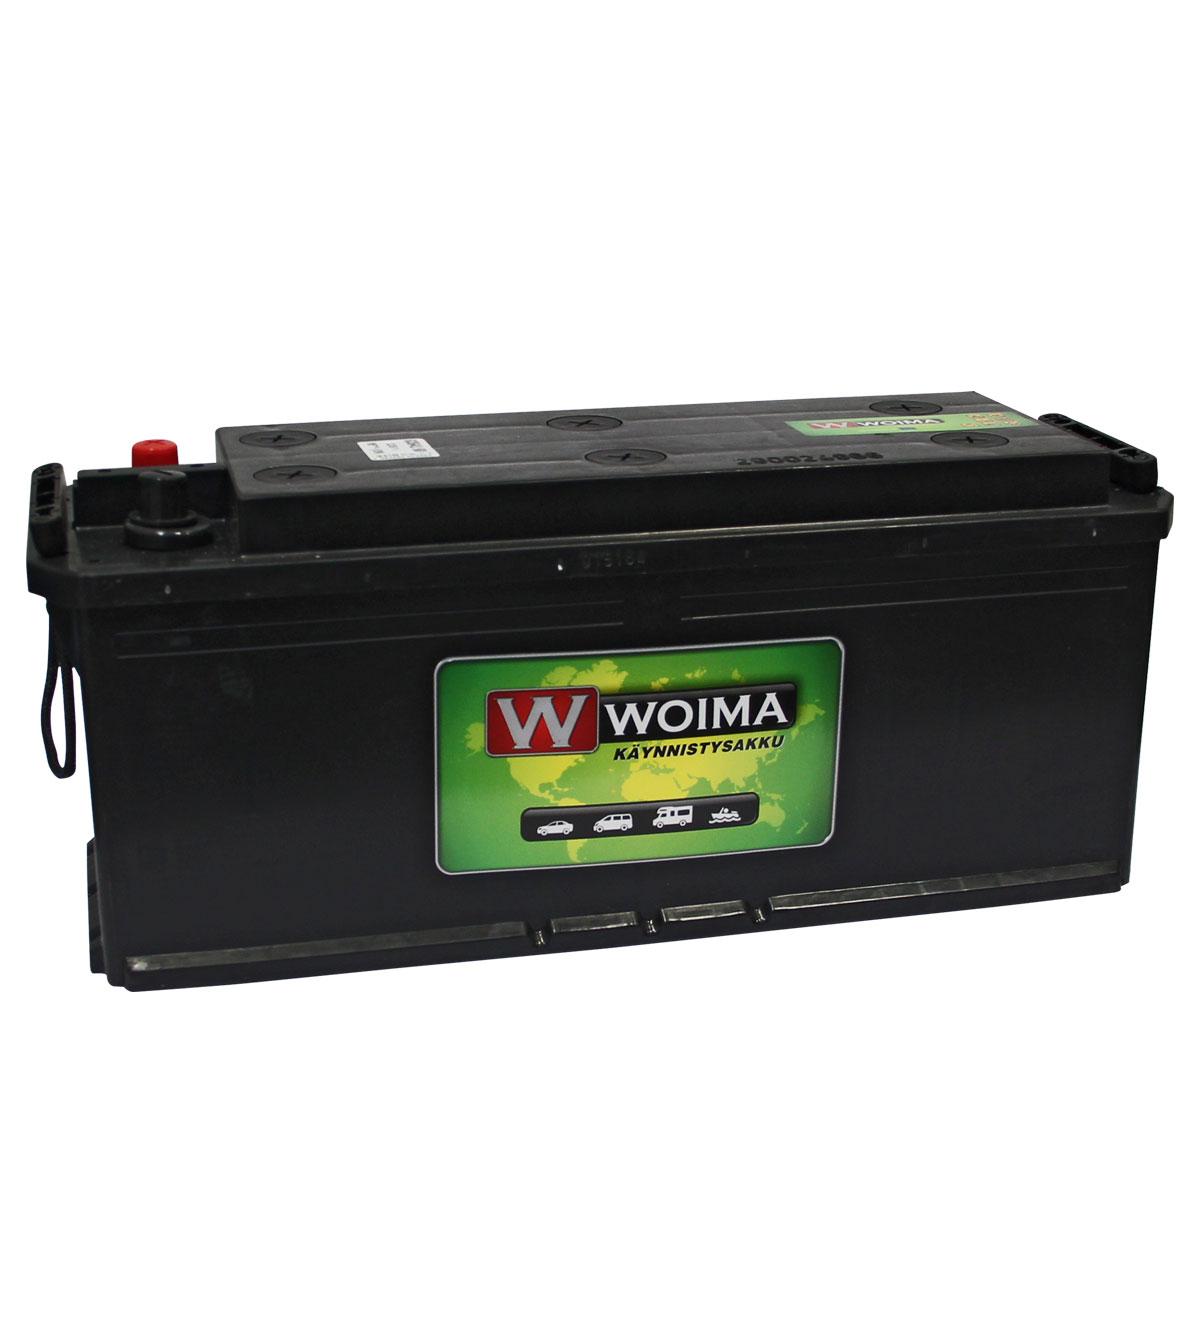 Woima HD 135Ah 1000A 514x175x210 +/- käynnistysakku